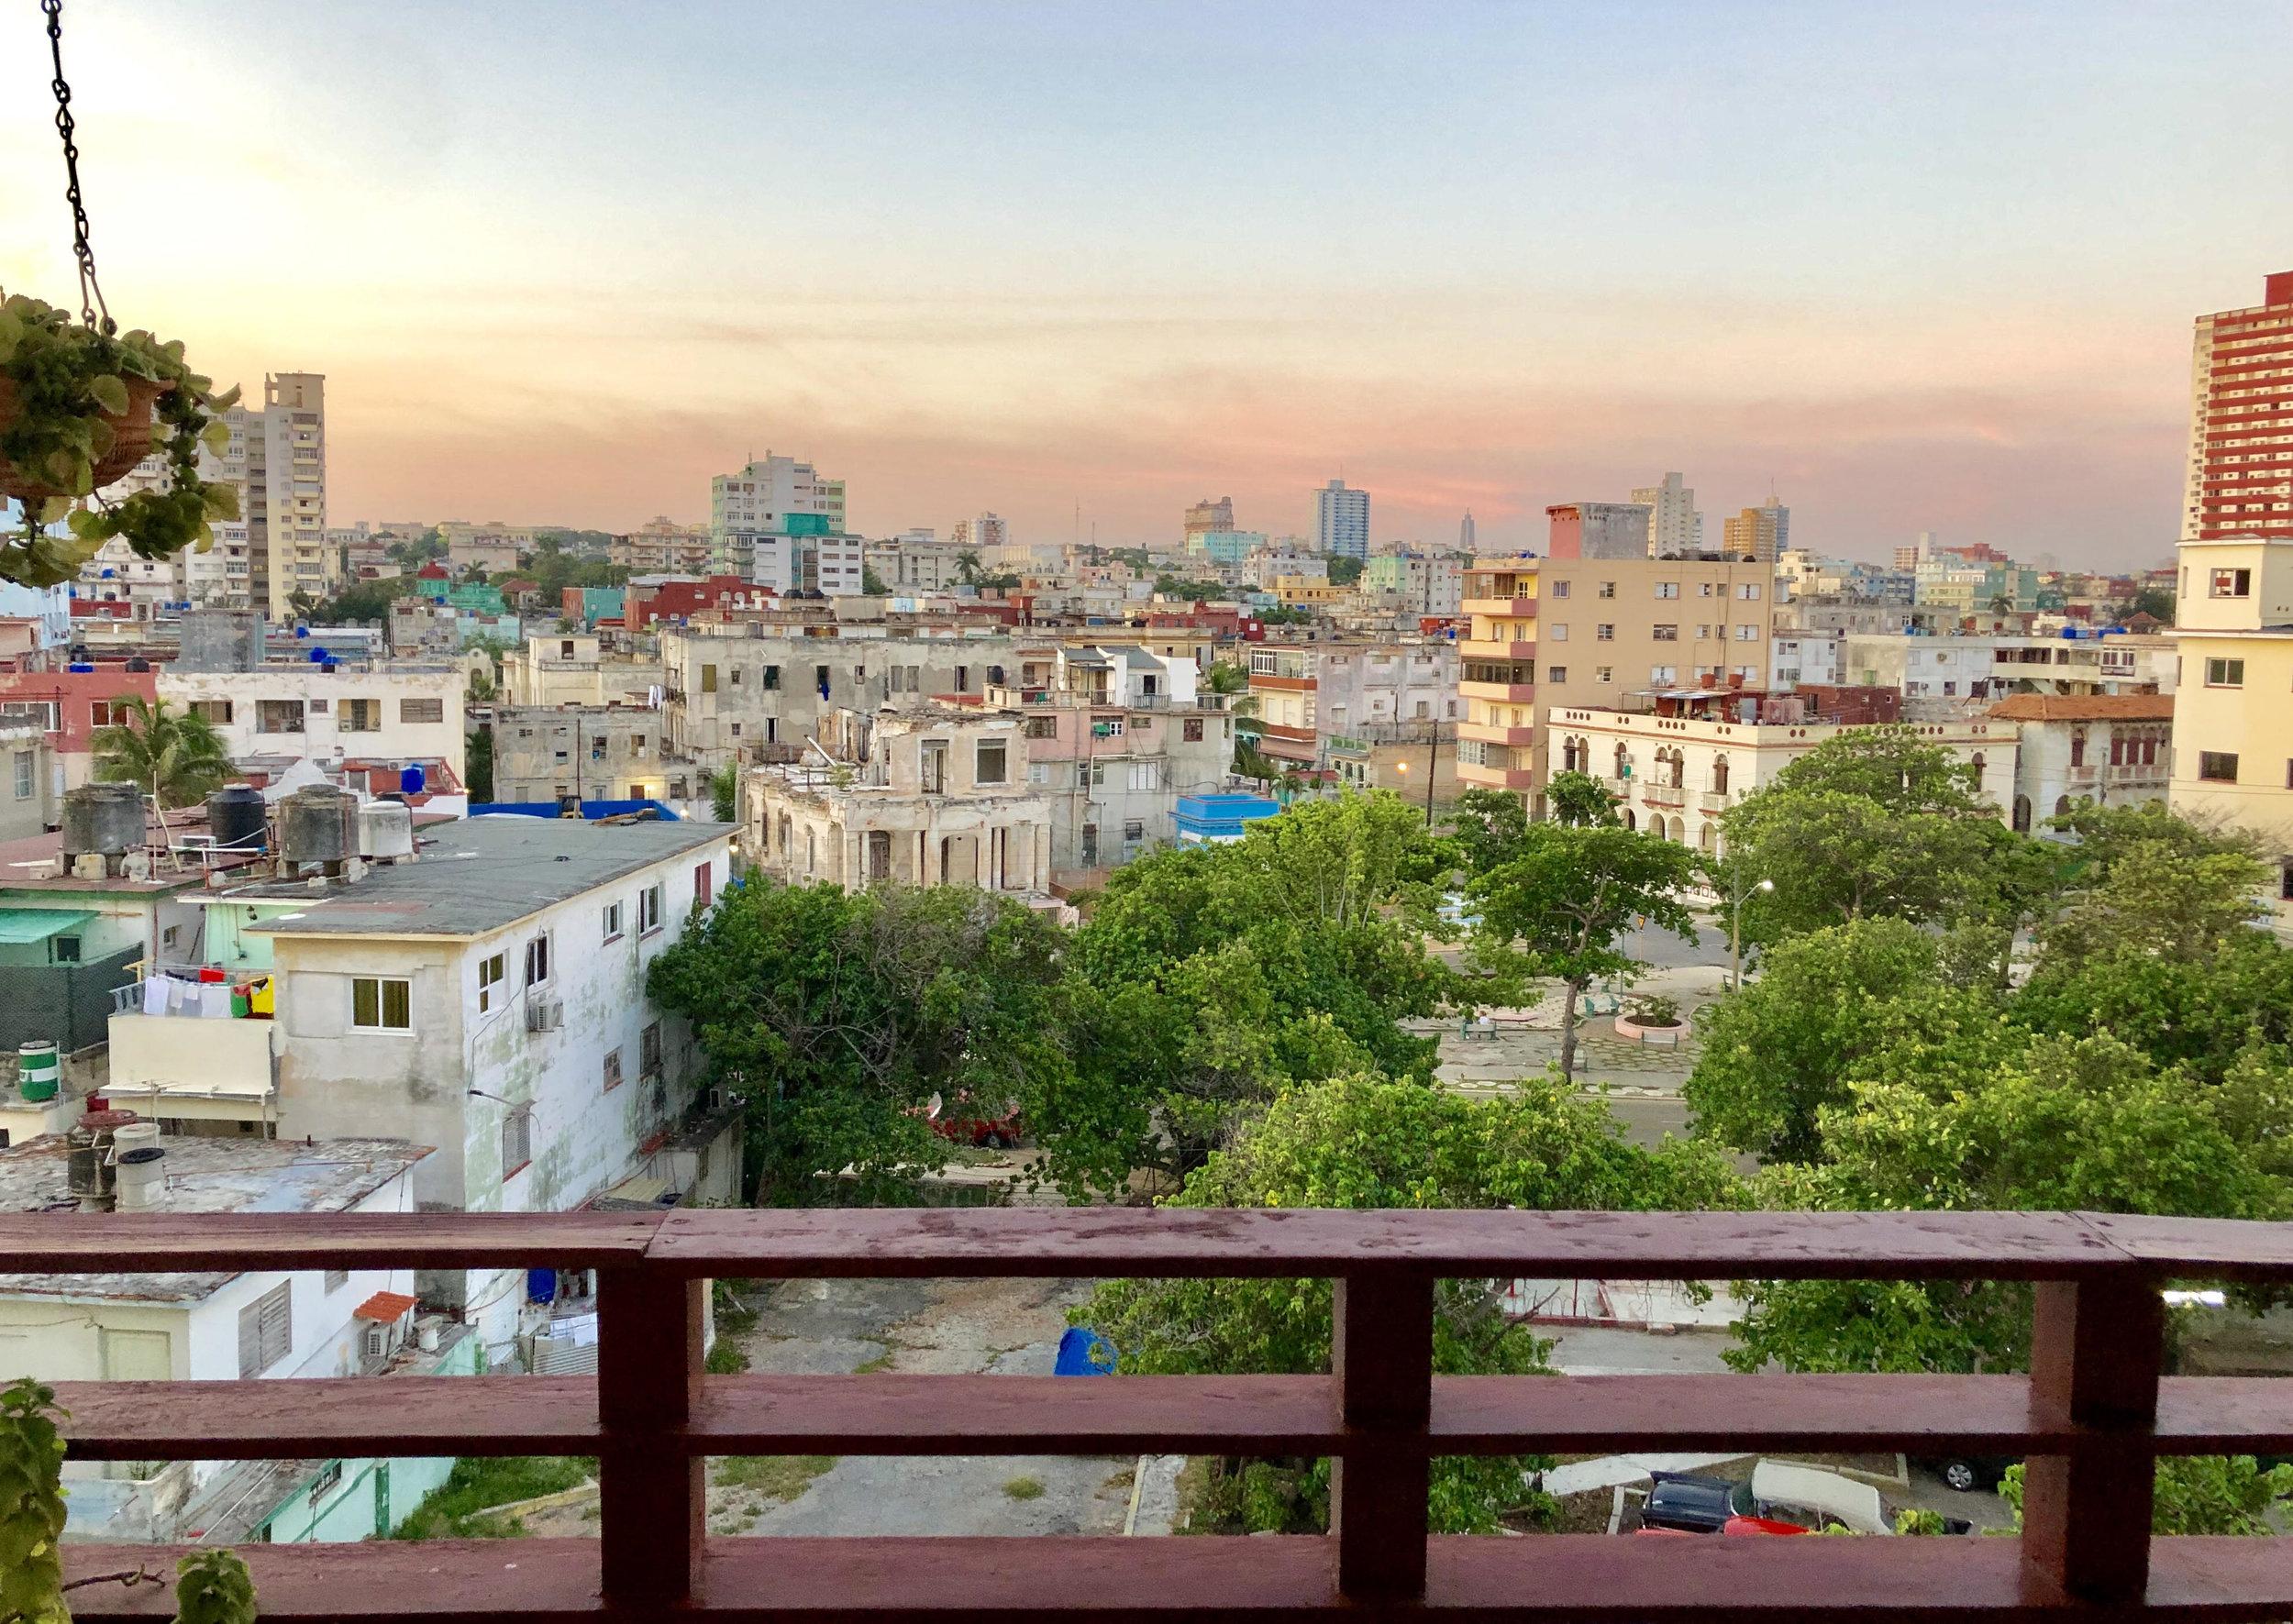 Cuba, Kaitlyn Alkass.jpg